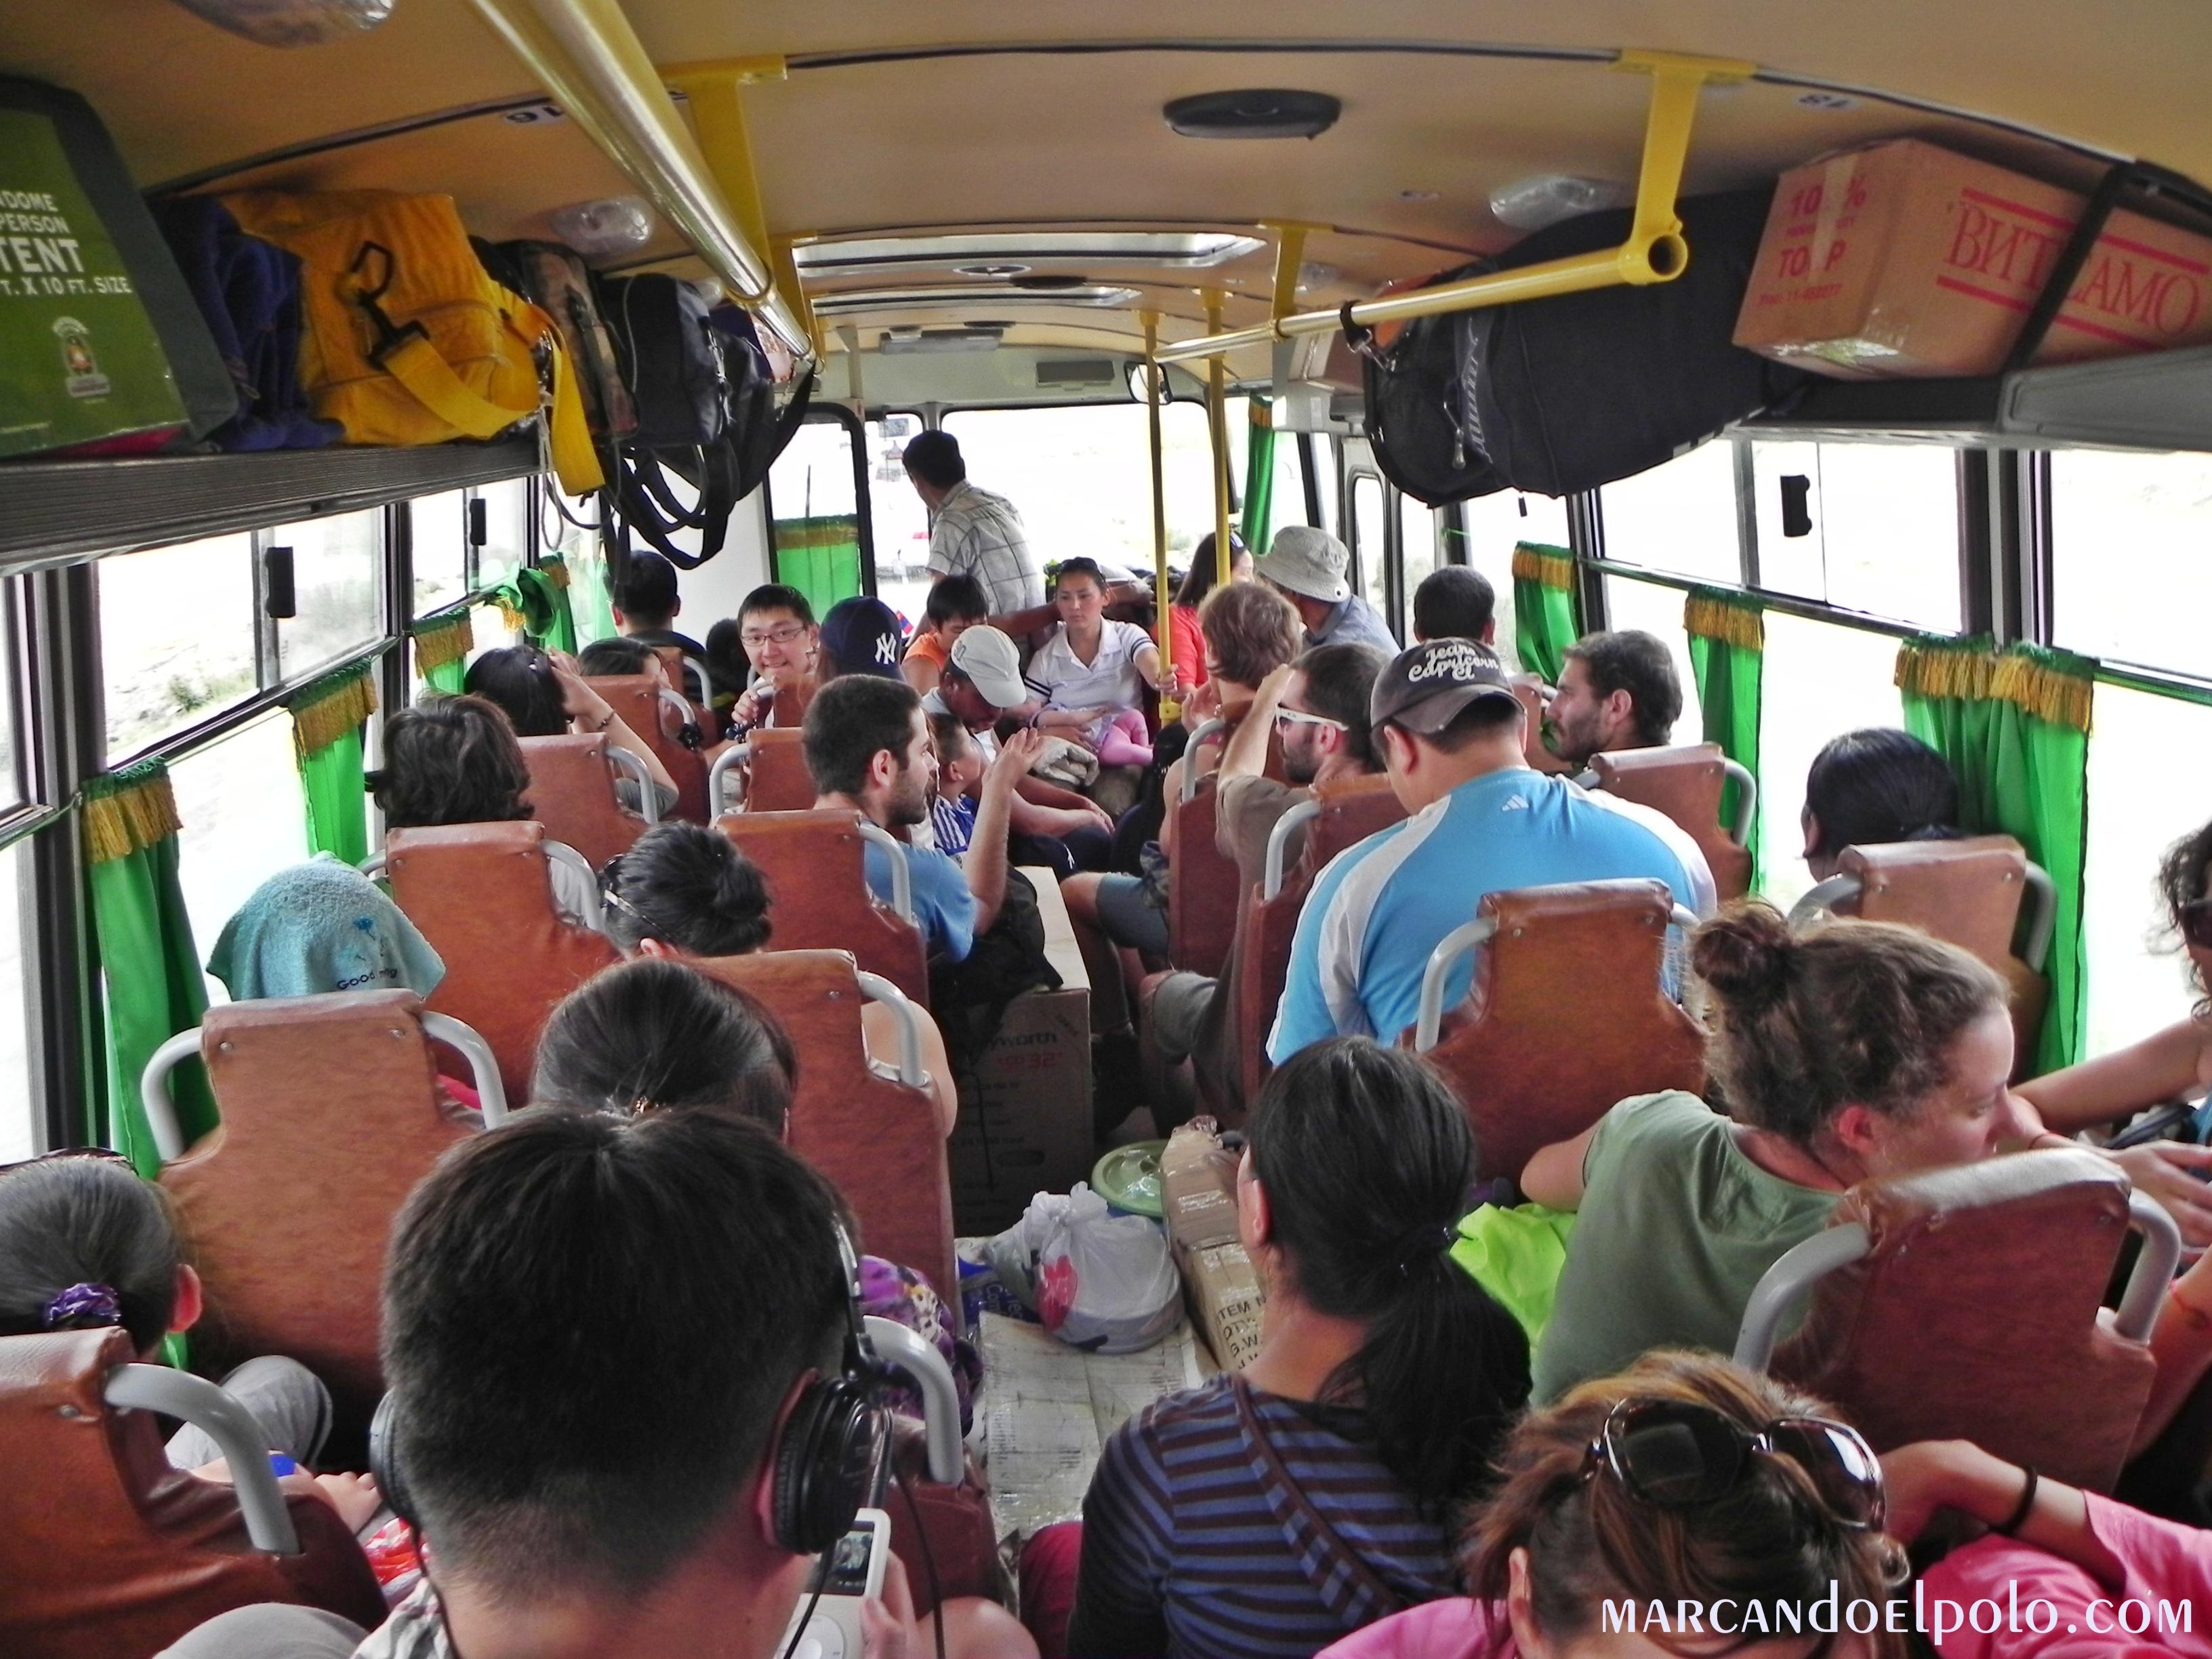 Viajar barato por Asia: bus público en Mongolia